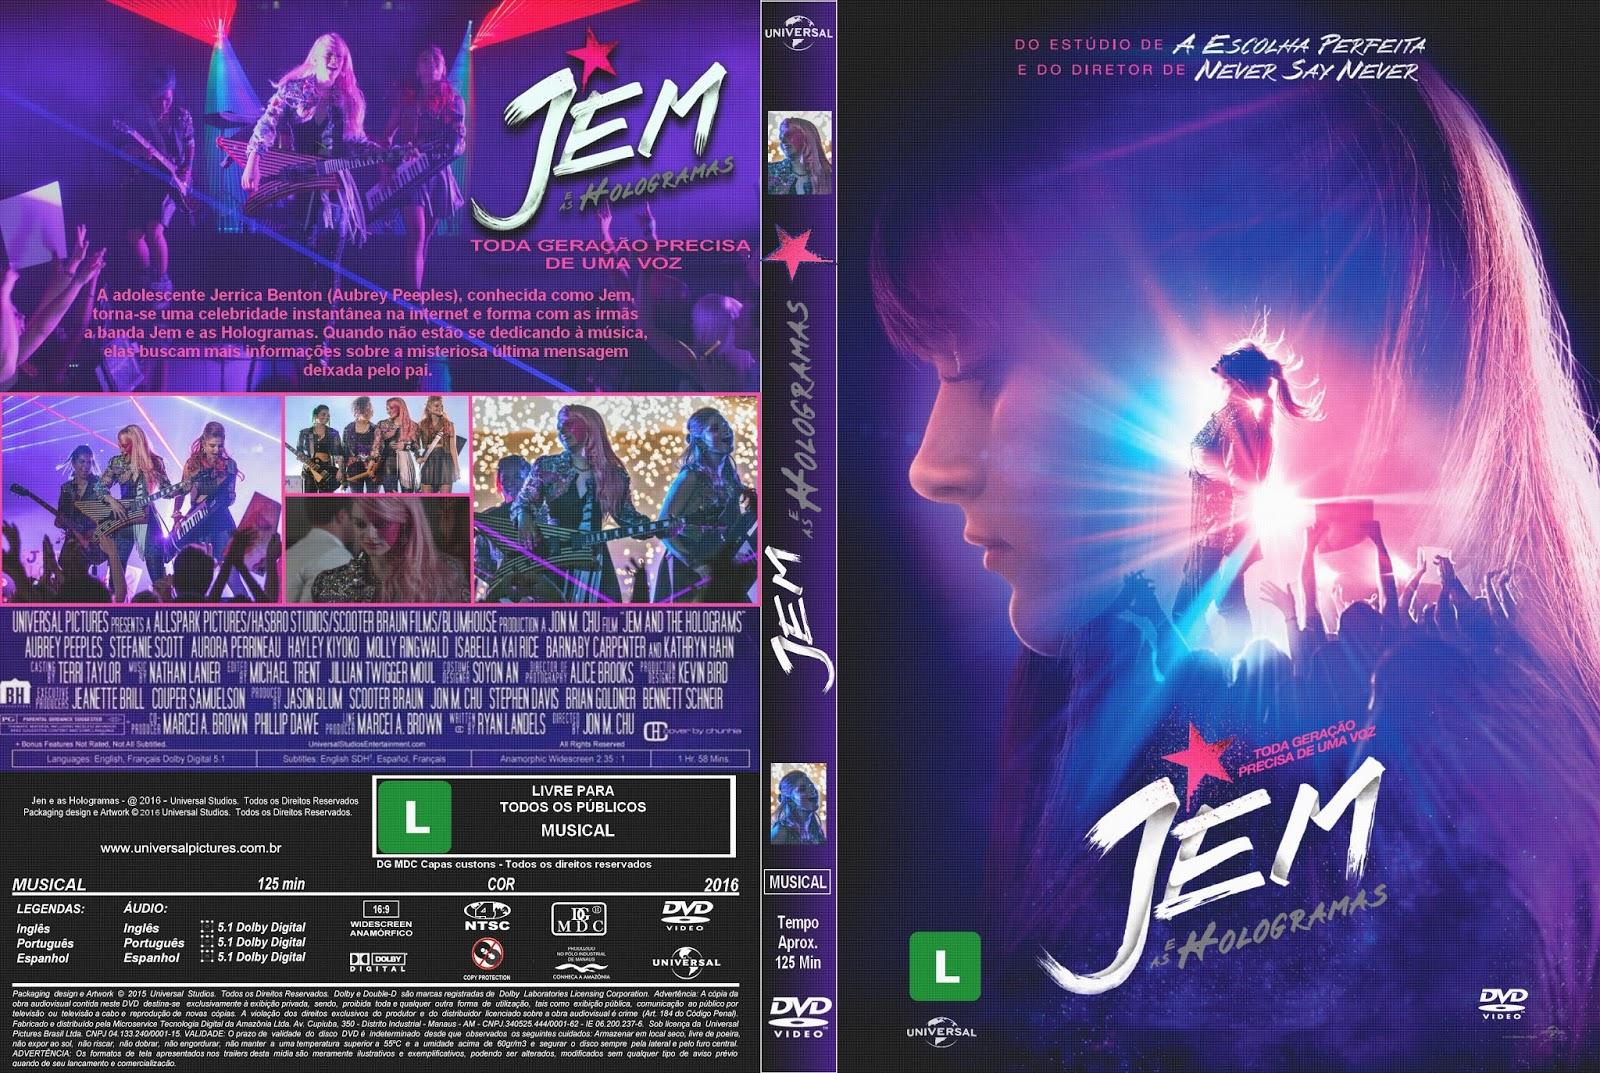 Jem e as Hologramas BDRip XviD Dual Áudio Jem 2Be 2Bas 2BHologramas 2B  2BXANDAO 2BDOWNLOAD